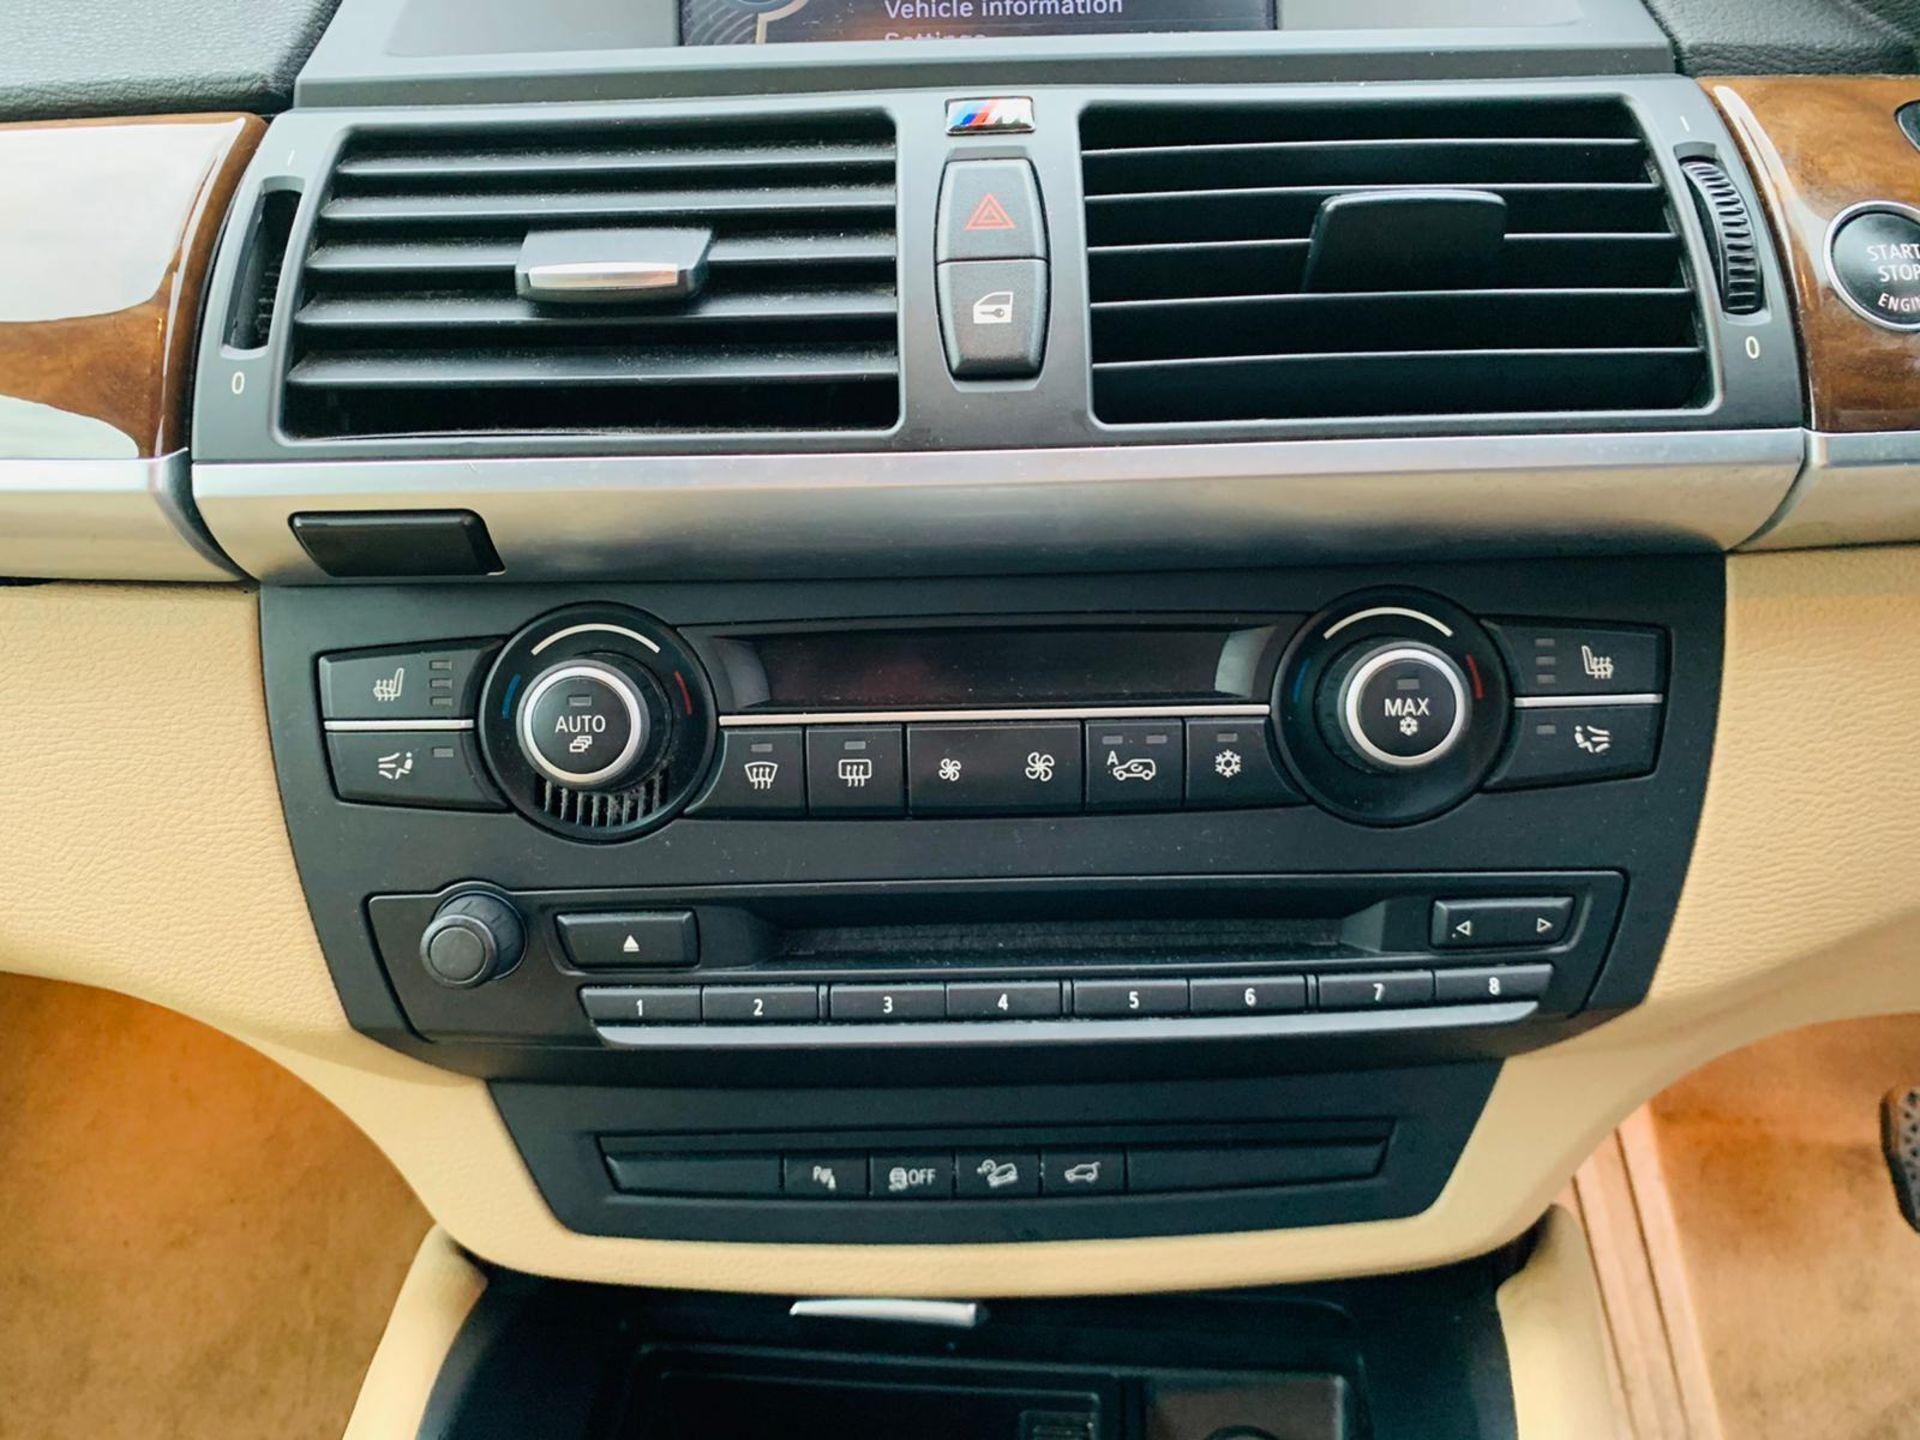 Reseve Met - BMW X6 xDrive 3.0d Auto - 2014 Reg - Leather Interior -Parking Sensors - Reversing Cam - Image 23 of 30